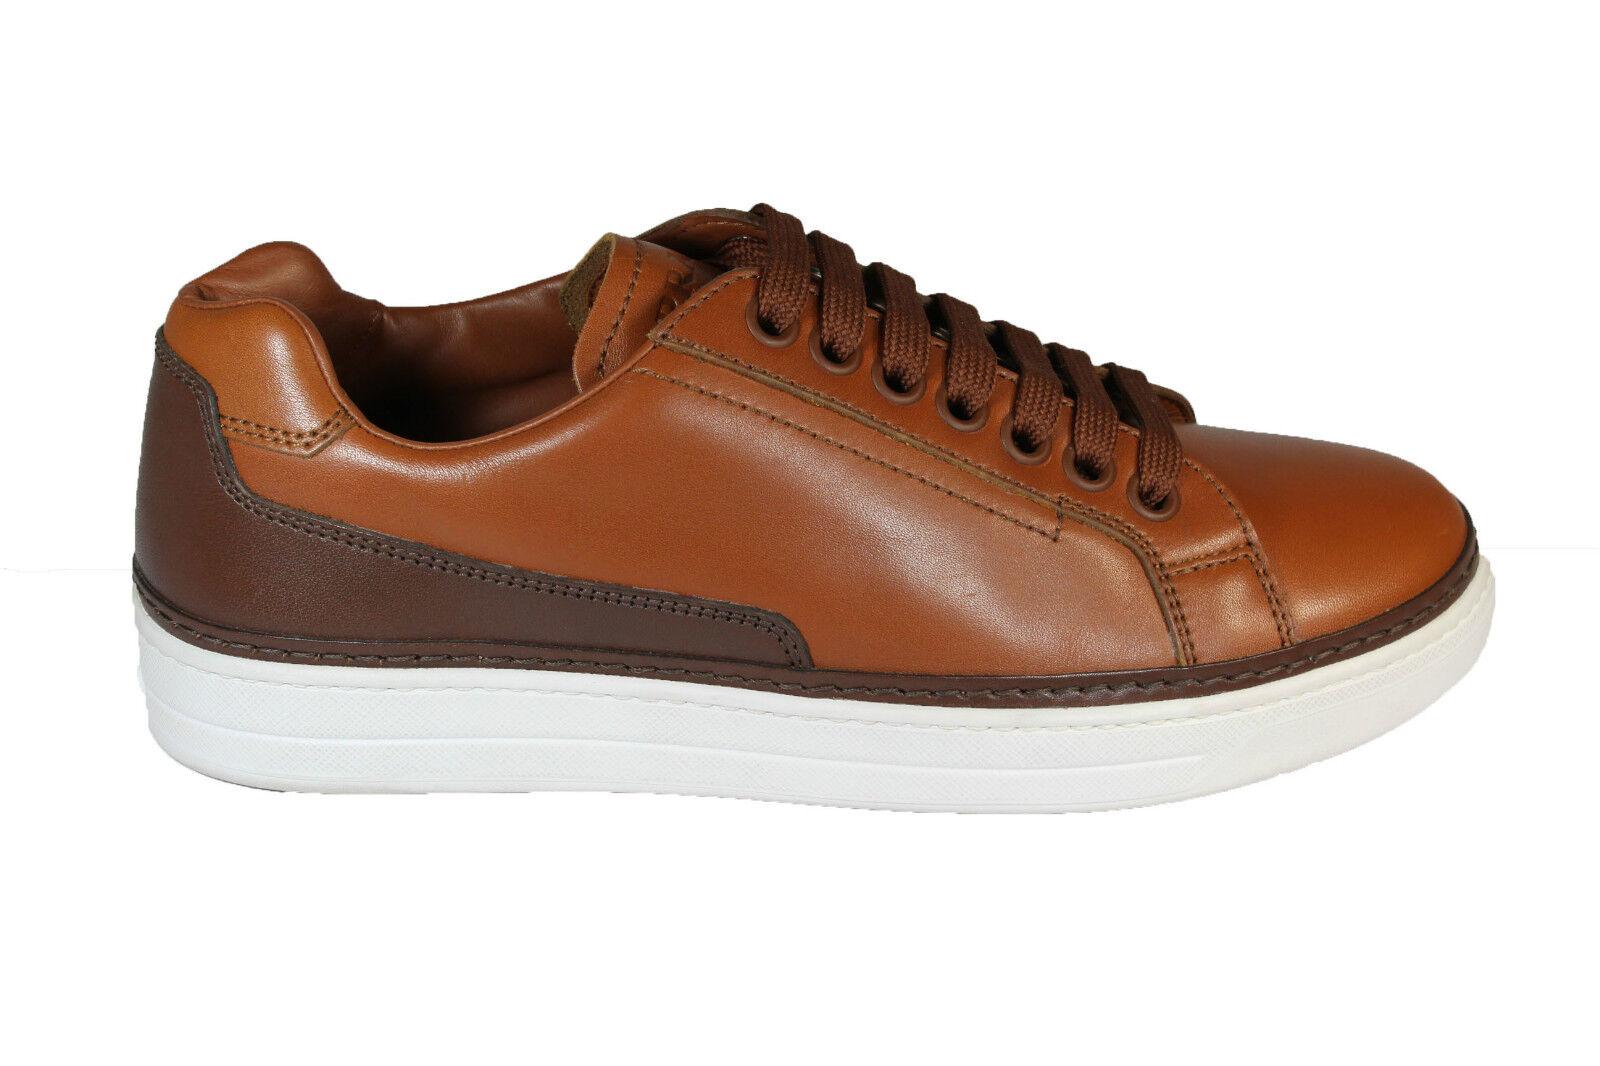 PRADA leather sneakers S/S 2016 2016 sneakers in pelle P/E 2016 2016 357cda